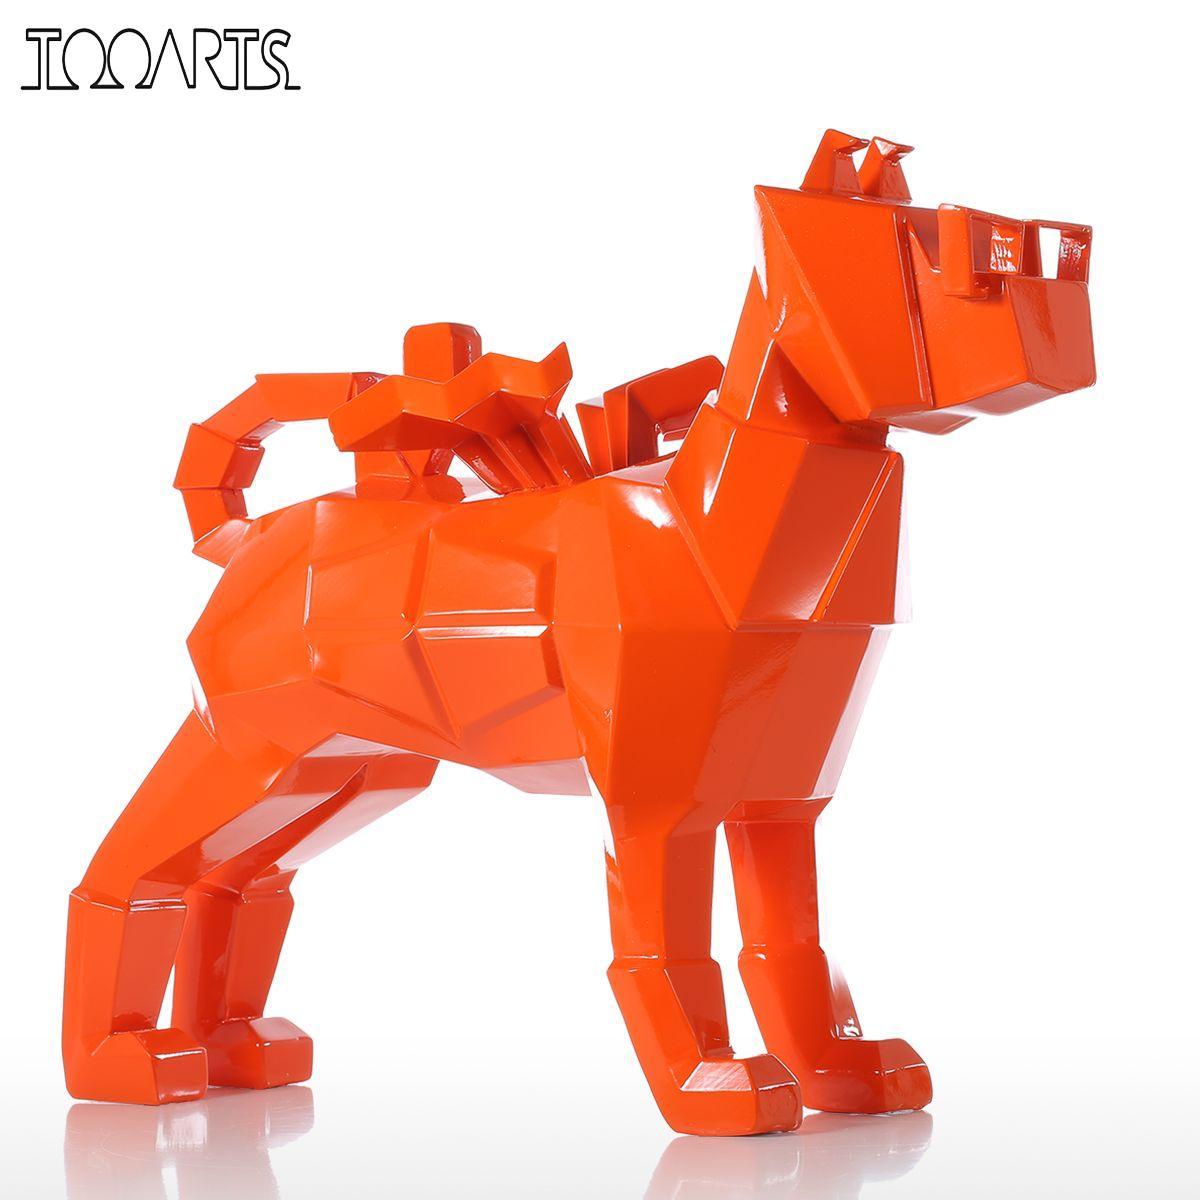 Tooarts Tomfeel Glasses Dog Figurines Orange Small Size Resin Sculpture Home Decor Modern Art Figurine Animal Statue Fiberglass Скульптура